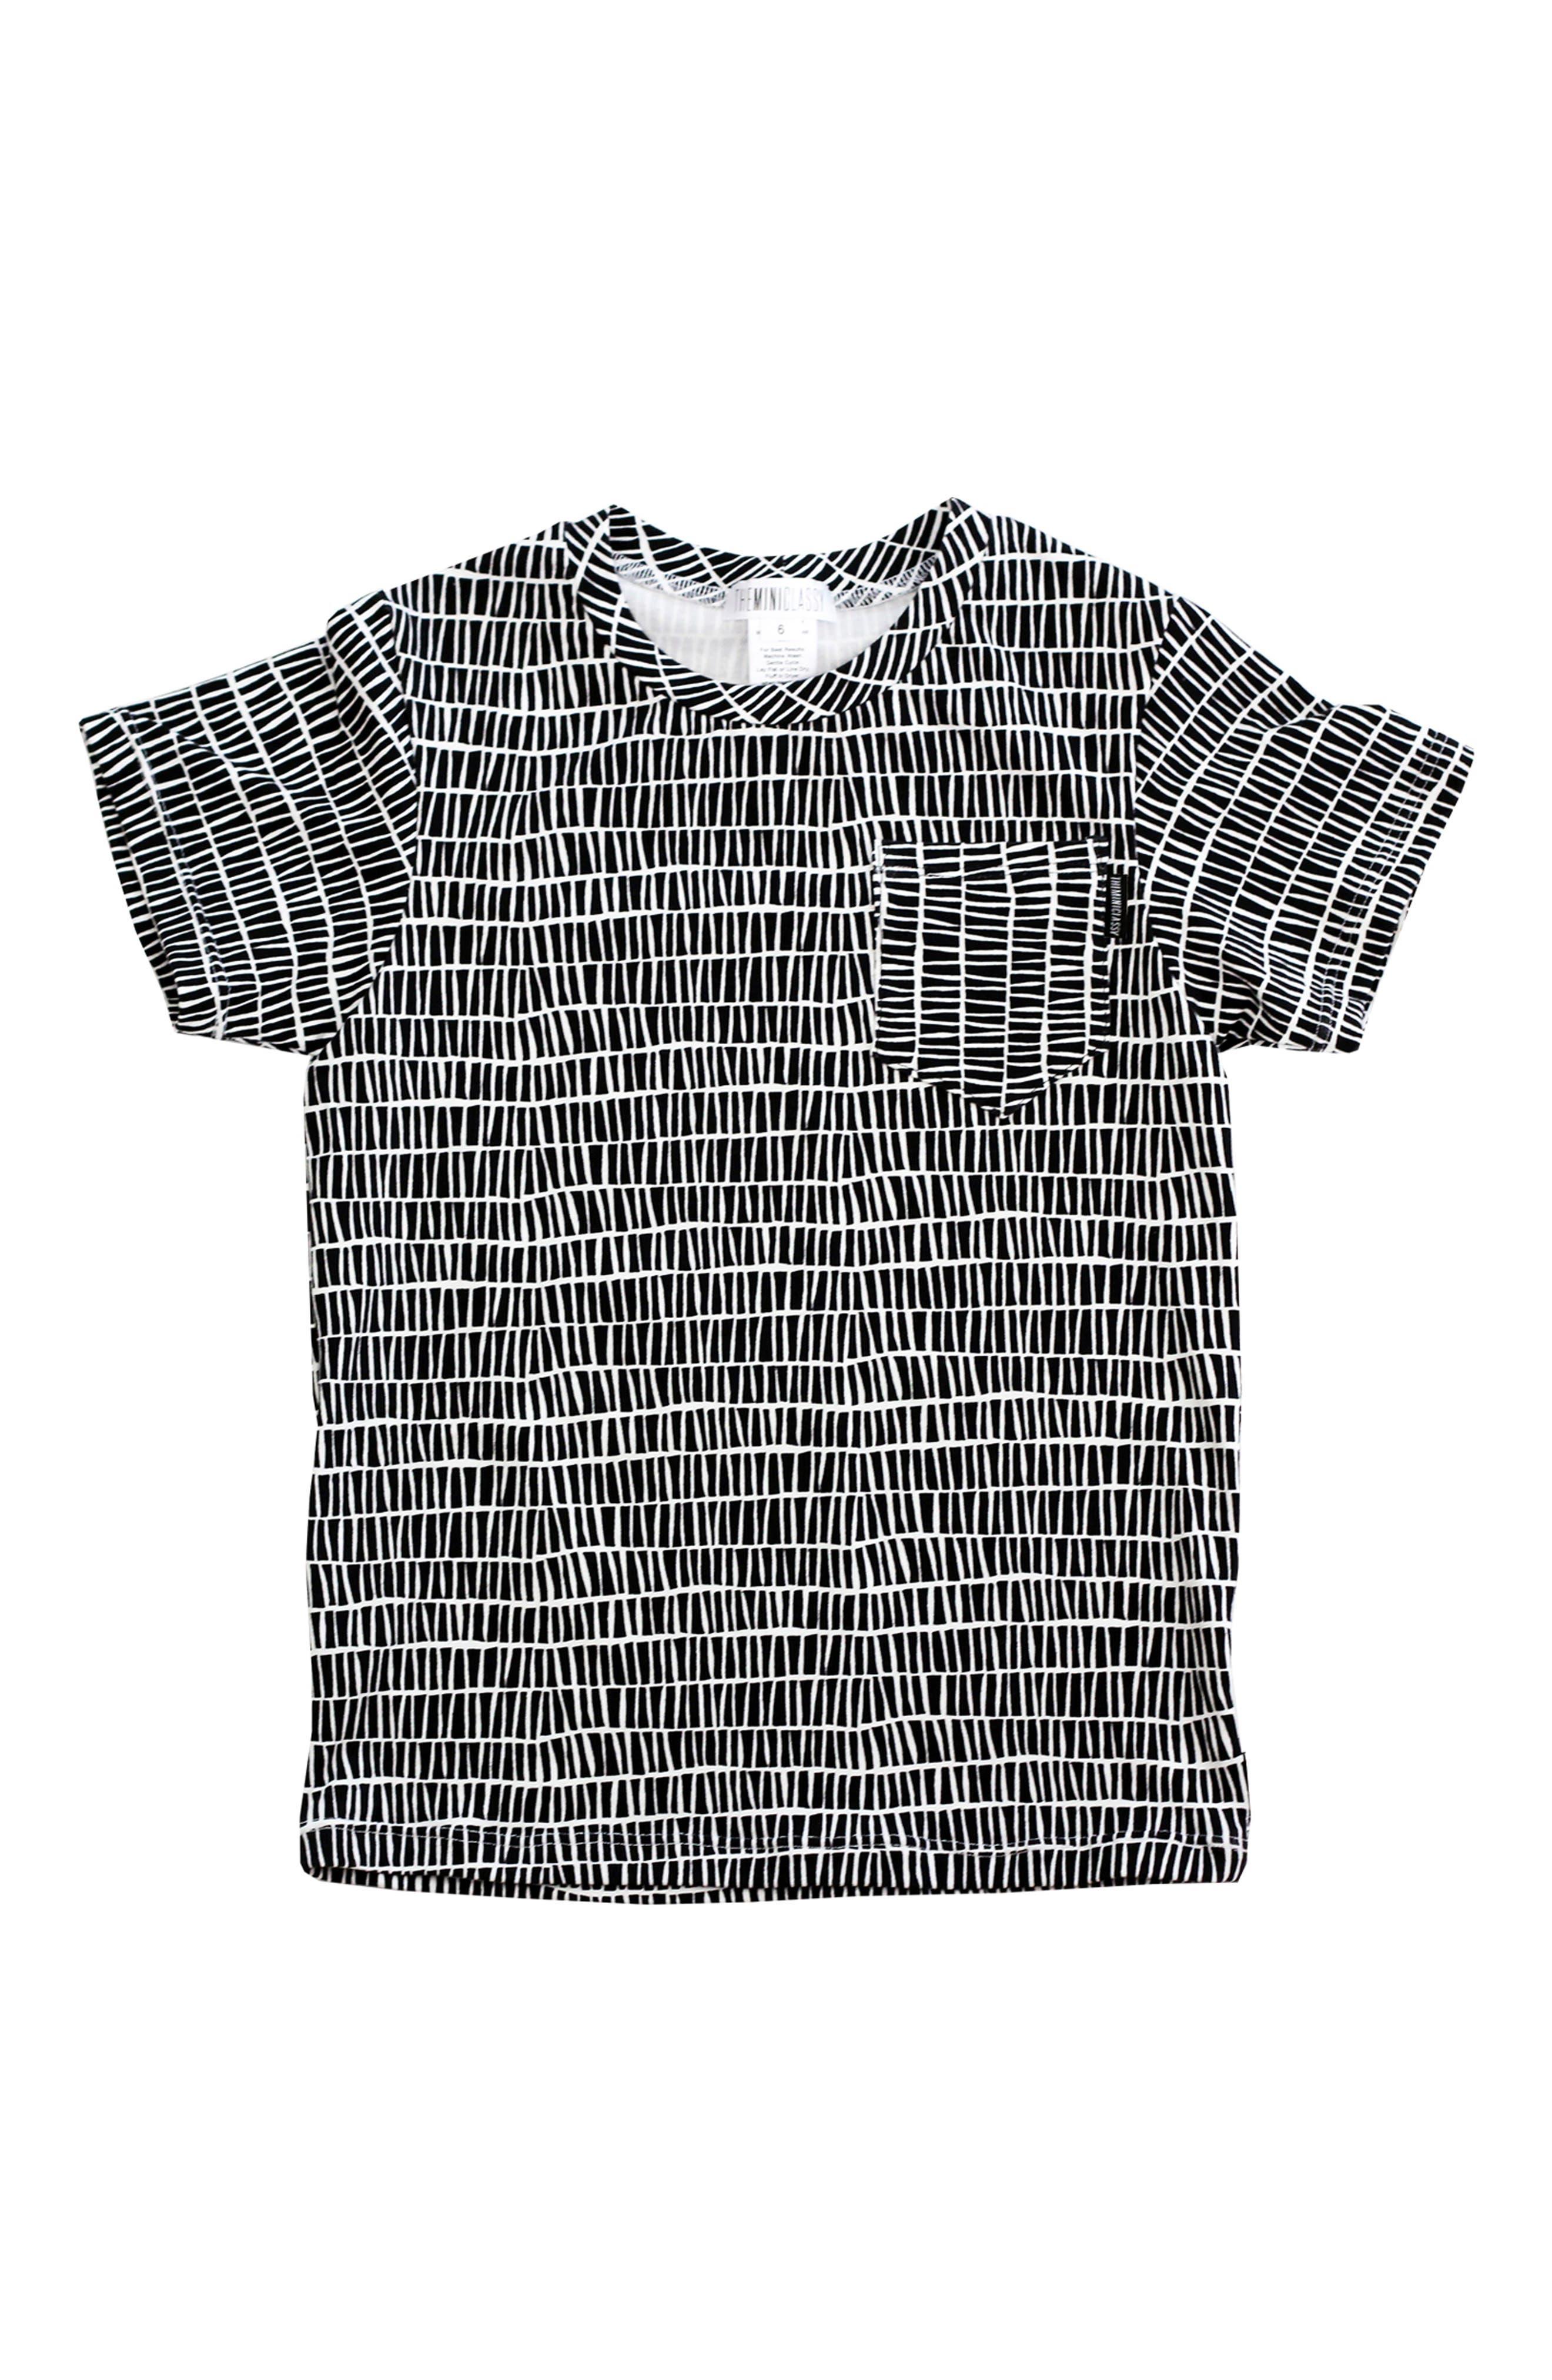 The Stix T-Shirt,                         Main,                         color, Black/ White